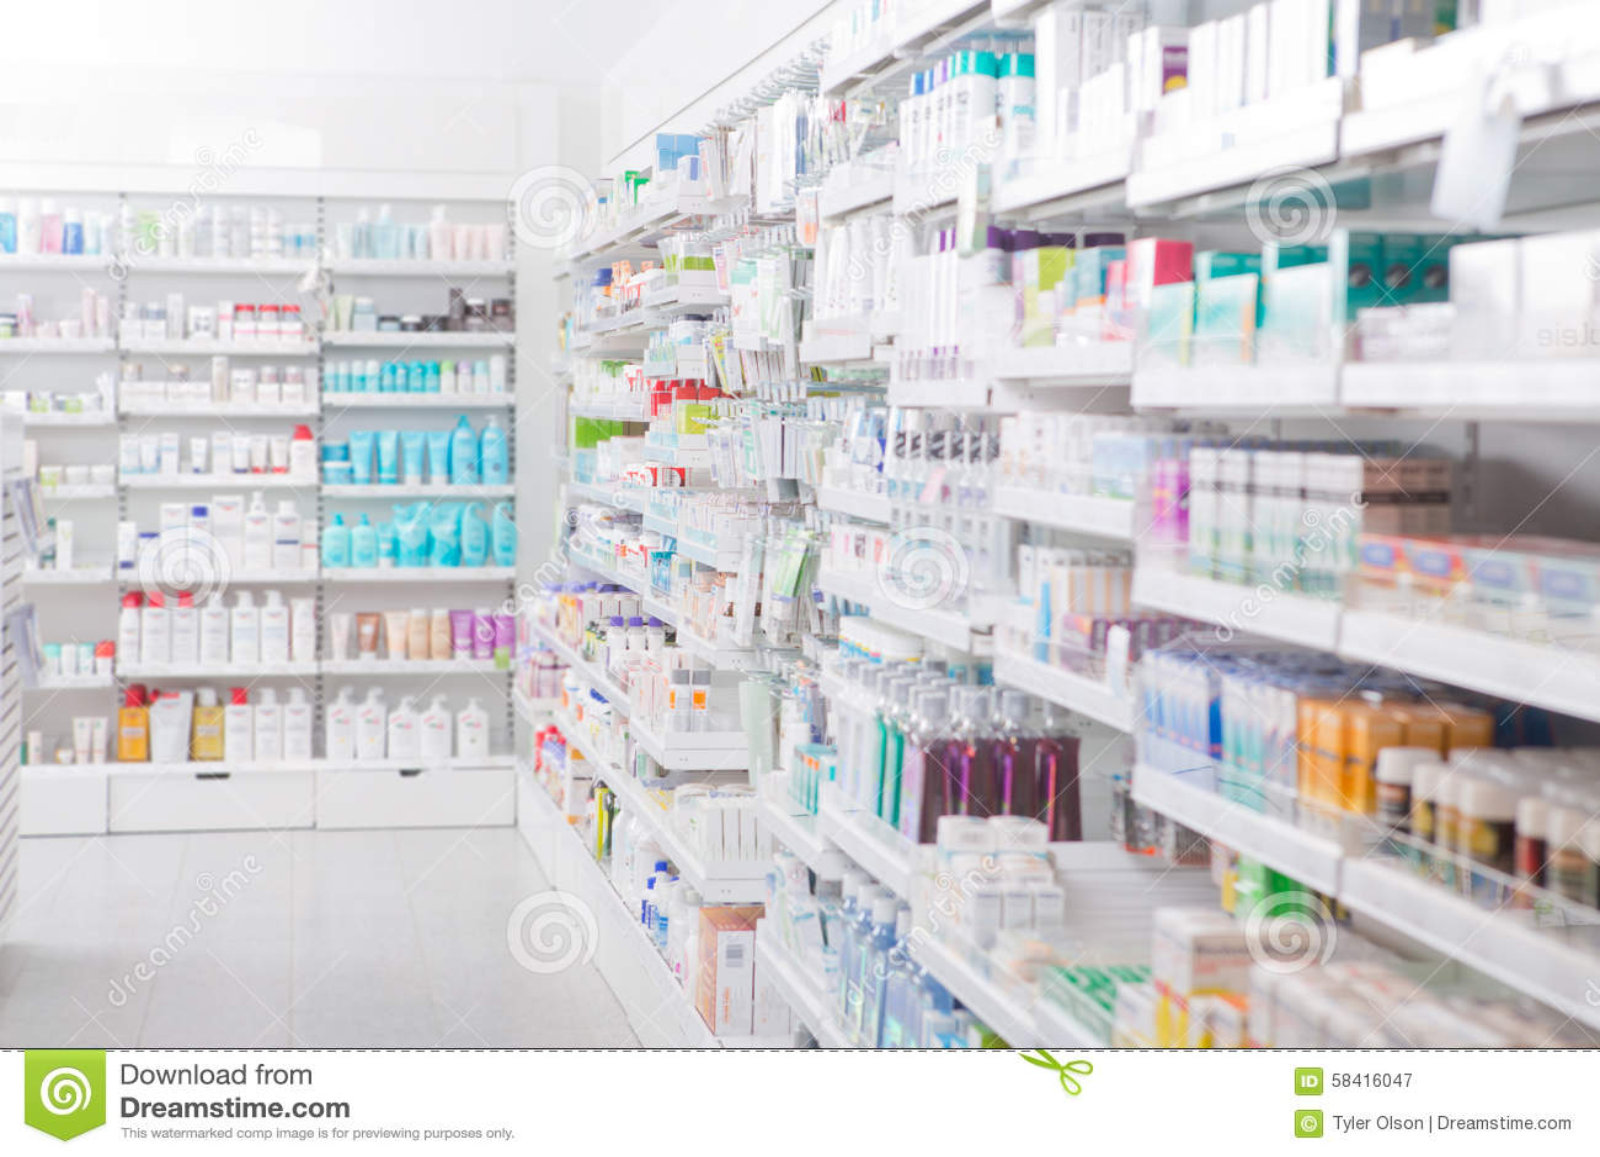 Pharmacy Interior Stock Photo Image 58416047